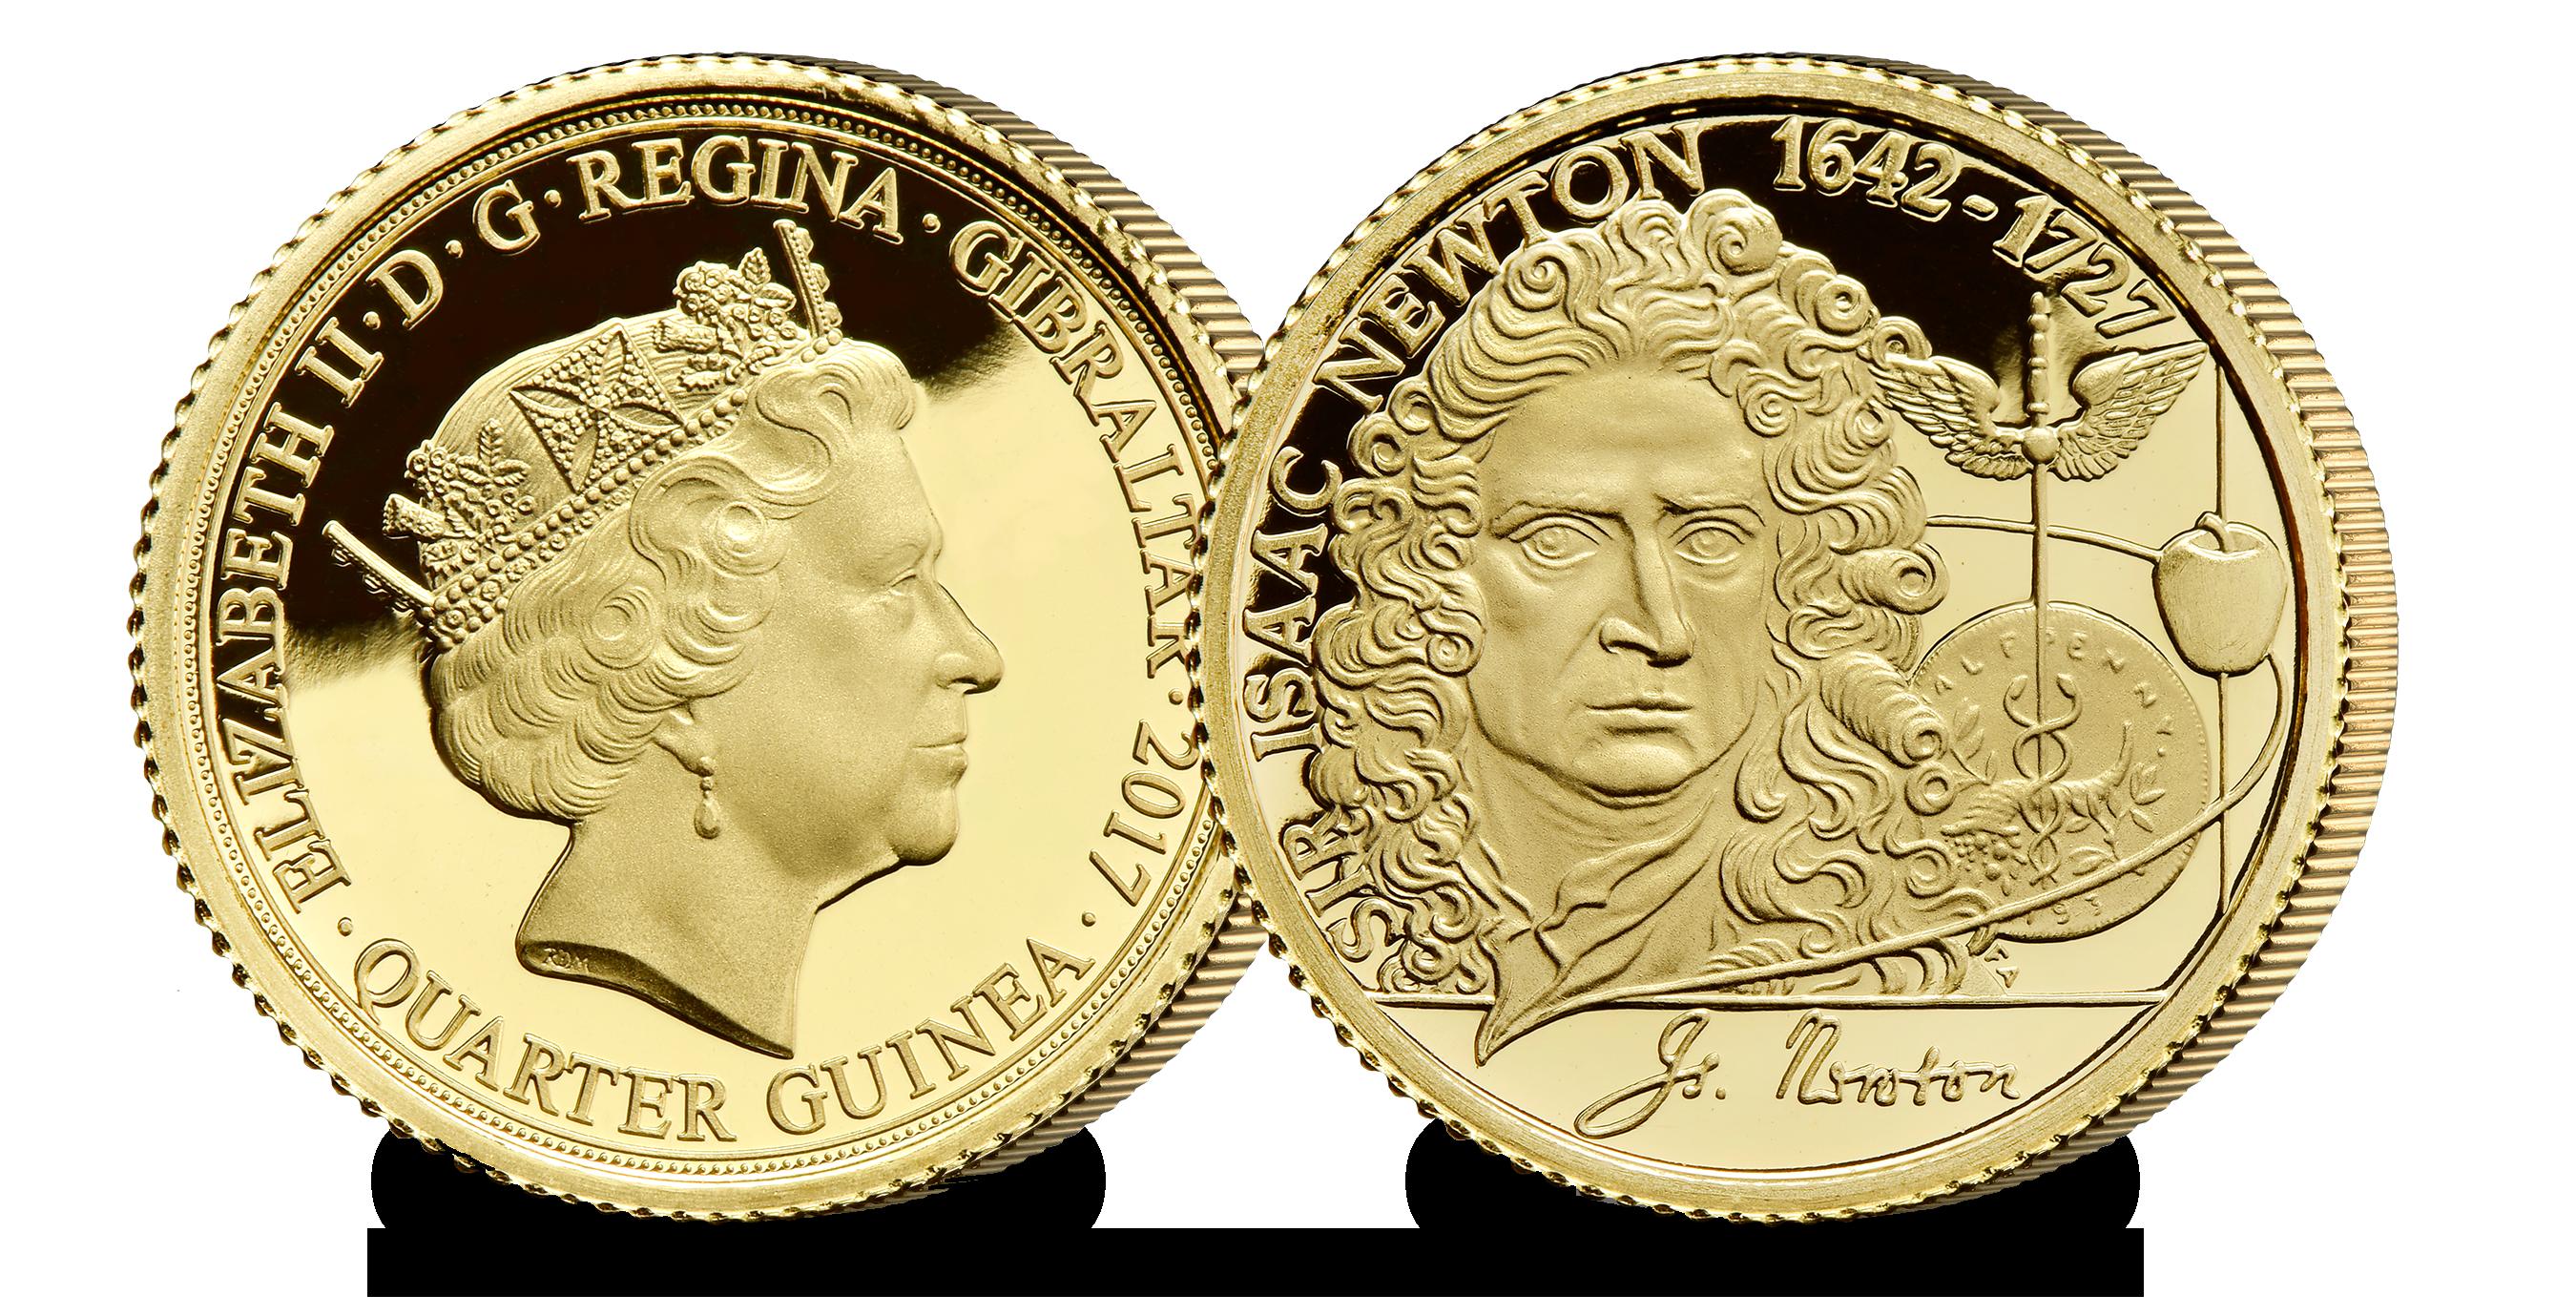 Newton Quarter Guinea - 375 years of Sir Isaac Newton